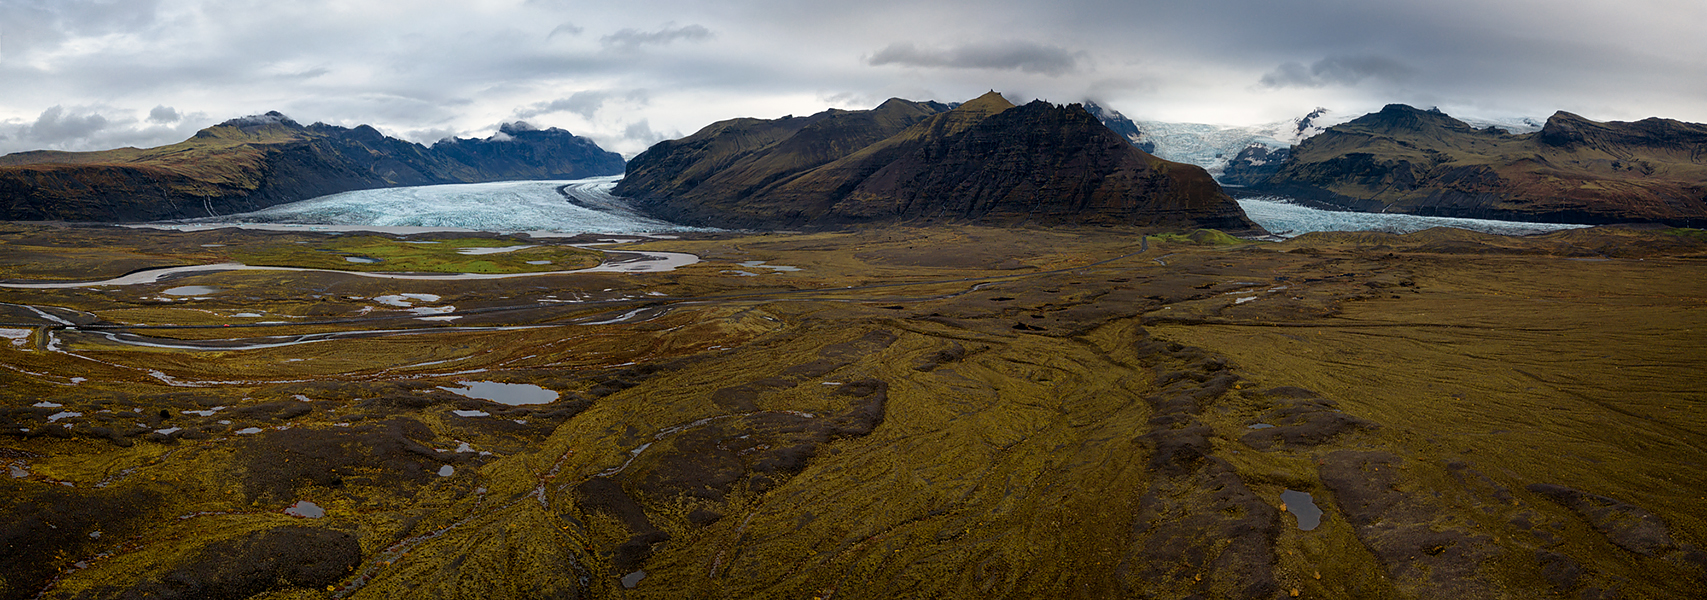 iceland pano 1.jpg